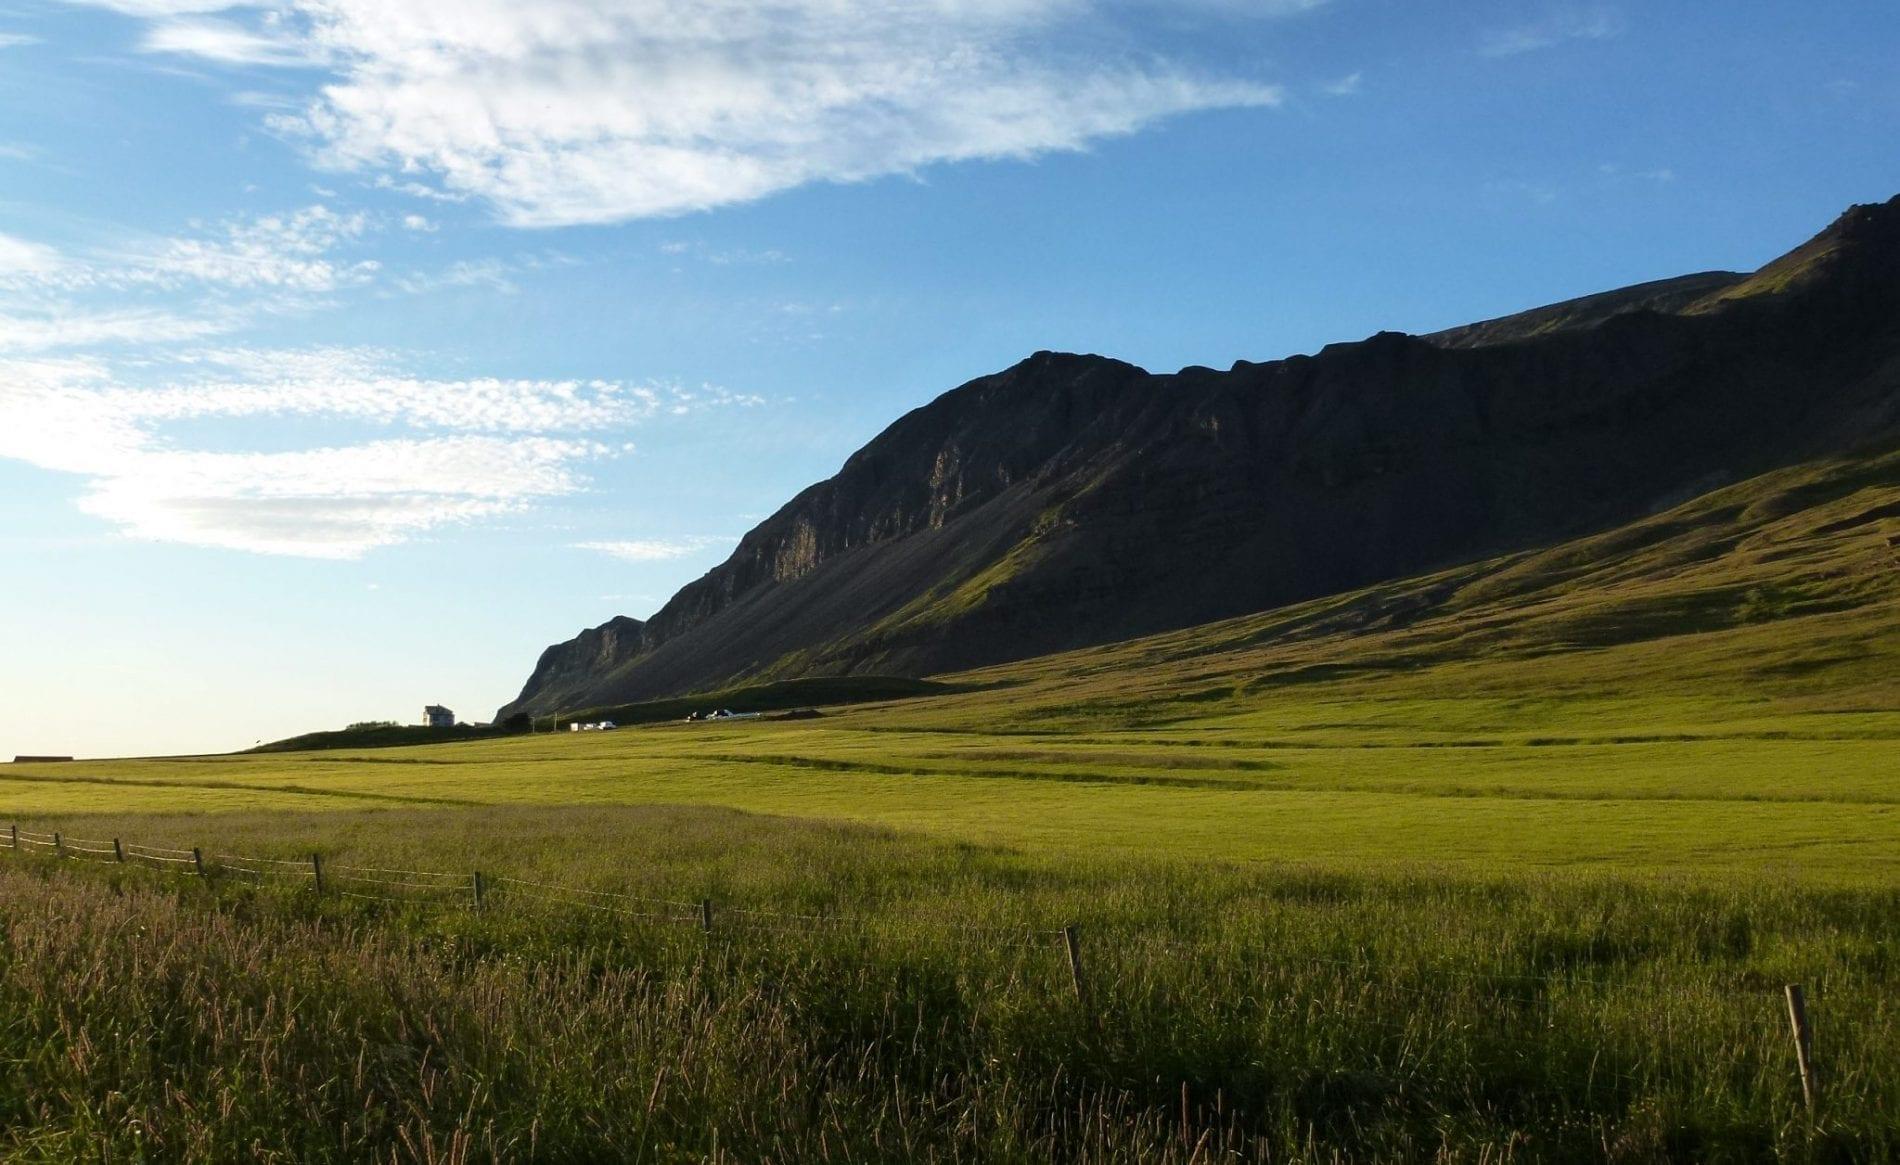 Hvammur farm seen from a far. By its side a green fenced grass field reaching a mountain